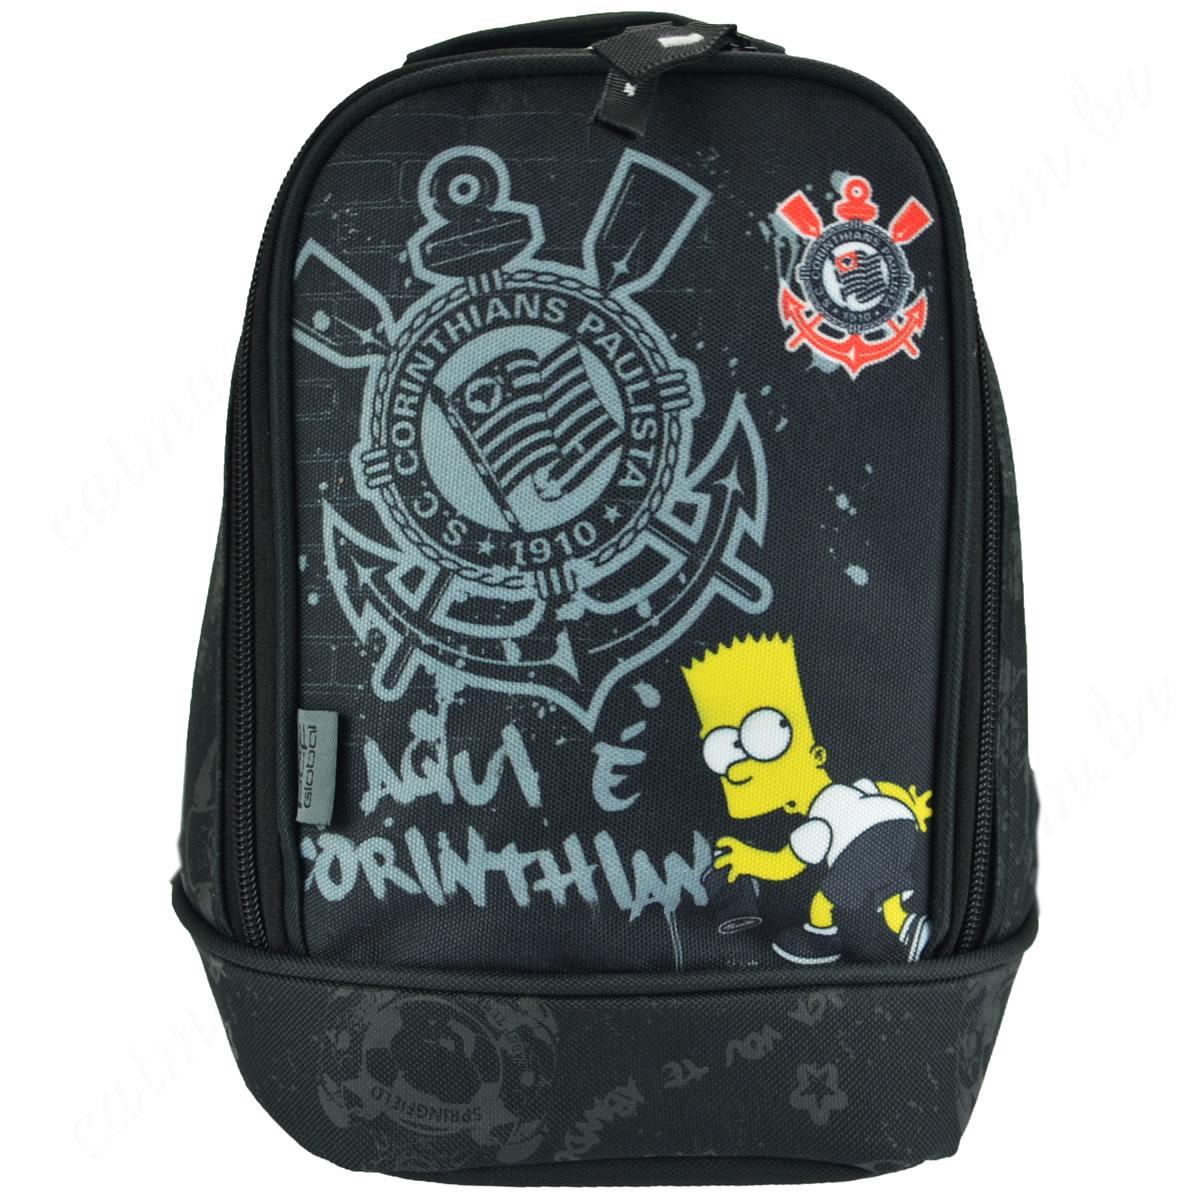 Lancheira Escolar Monfort Simpsons Corinthians Bart Timao 940C11